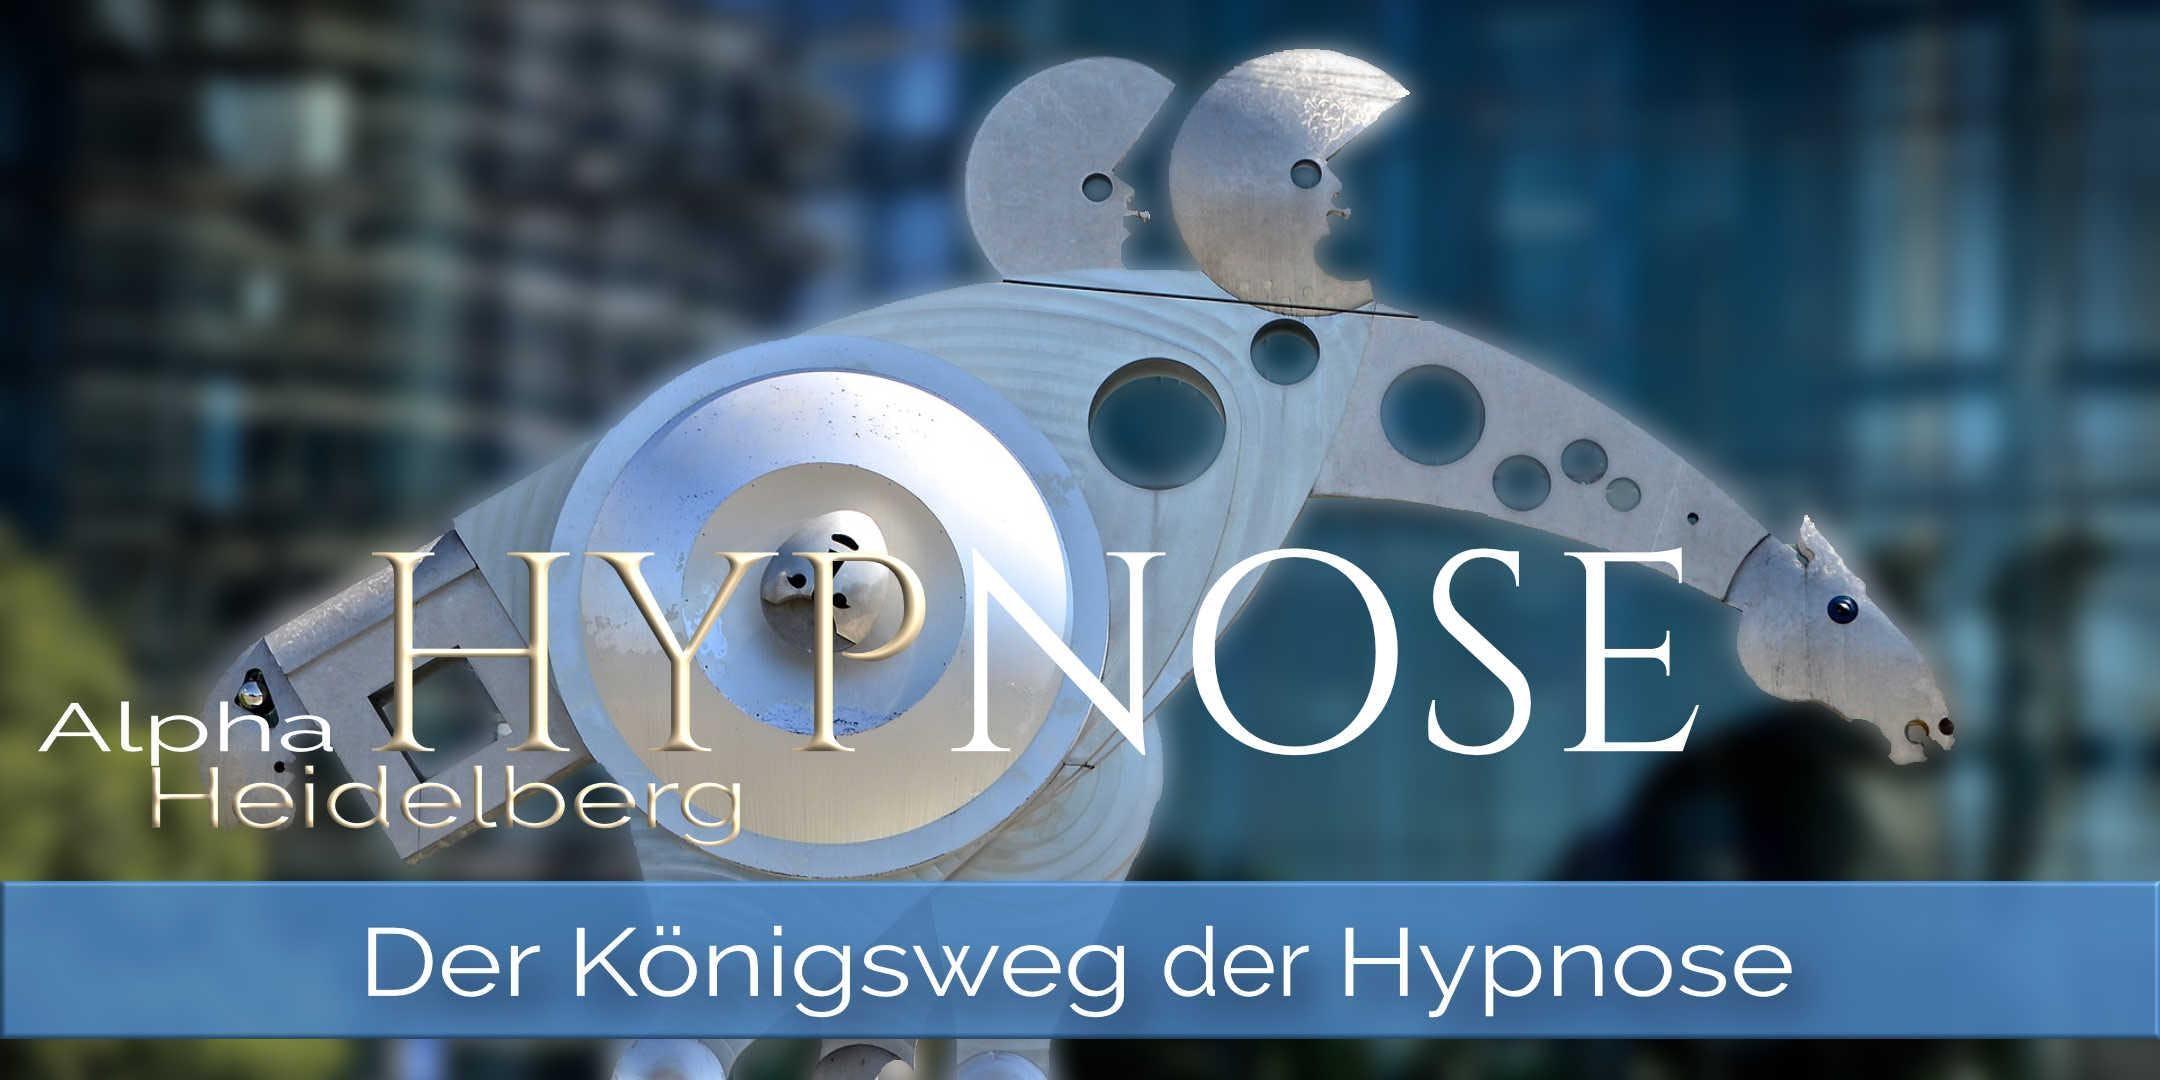 ALPHA HYPNOSE • Der Dialog der Seele • Der Königsweg der Hypnose